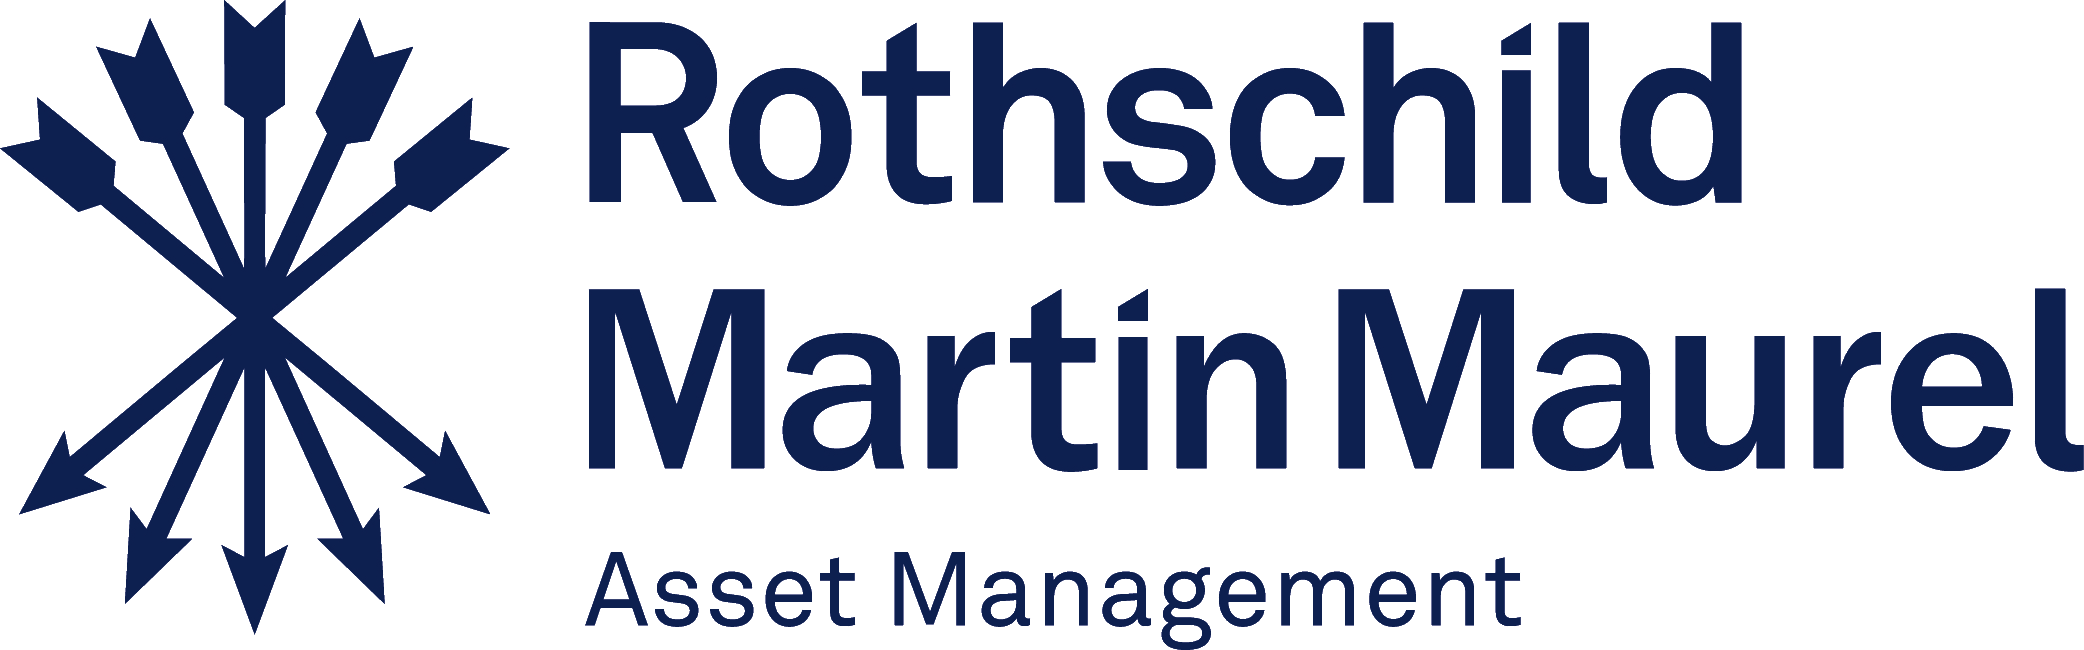 rothschild martin maurel asset management - logo